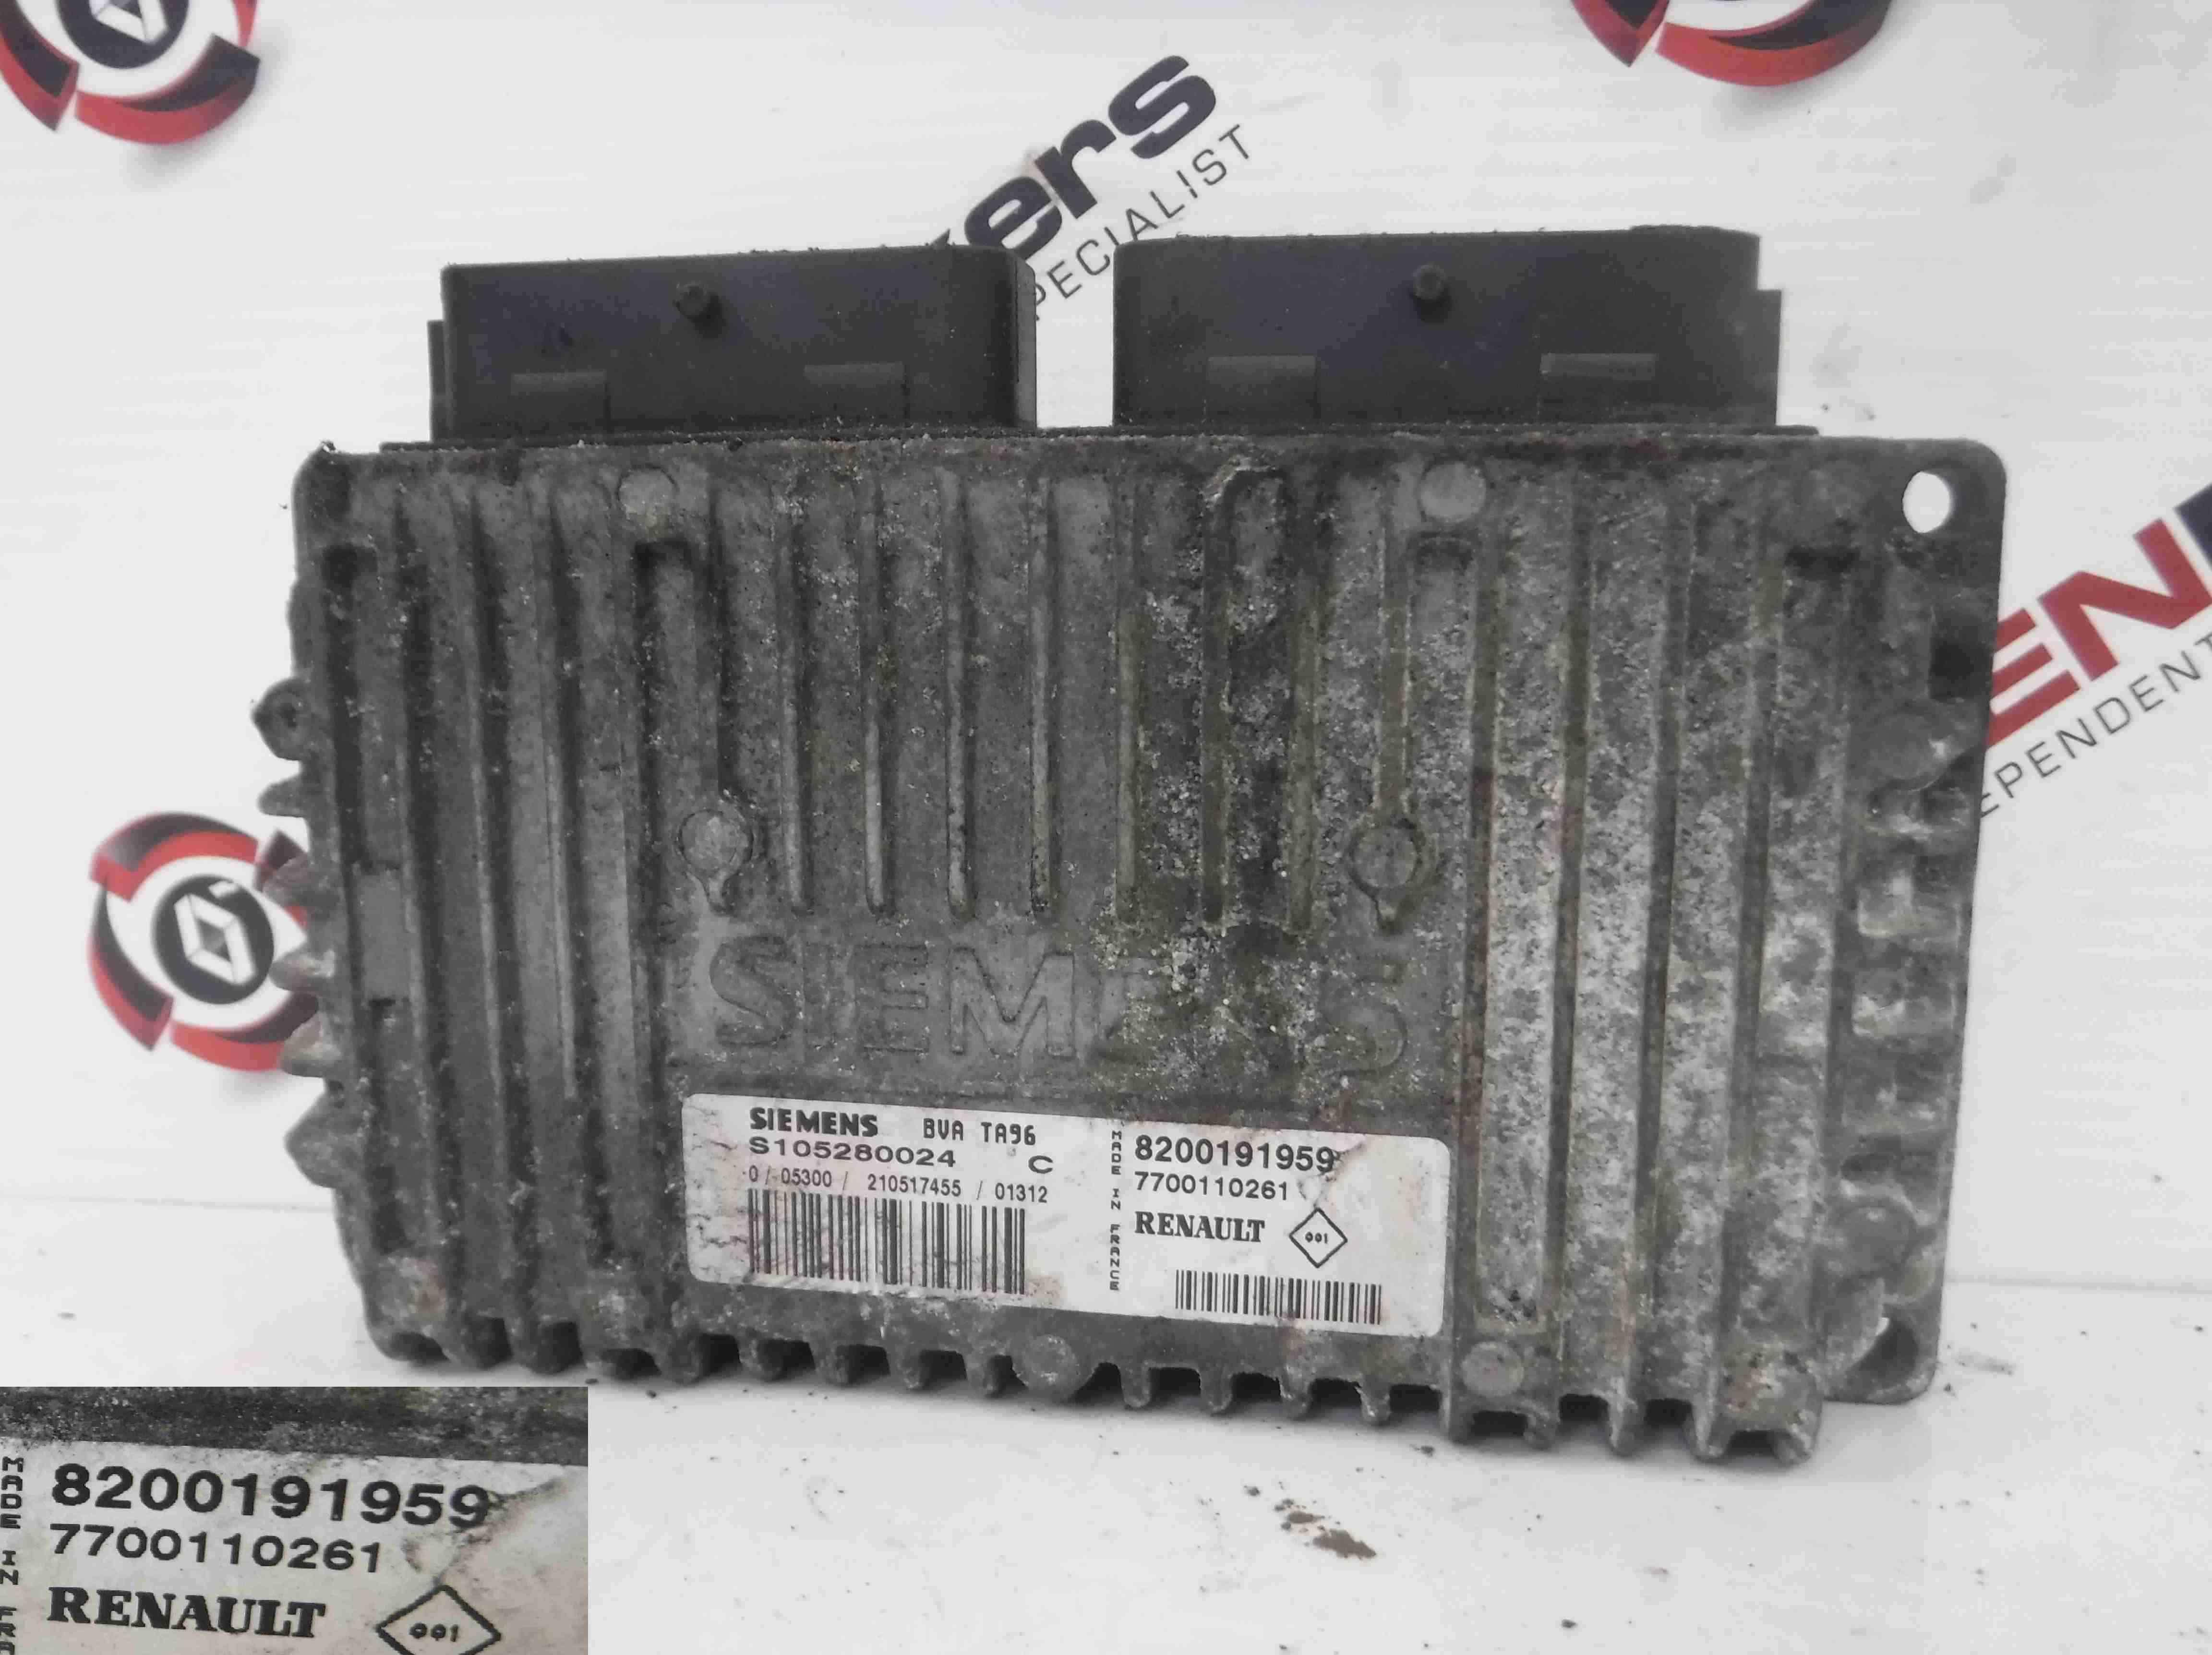 Renault Scenic 1999-2003 Automatic Gearbox ECU Computer 8200191959 7700110261